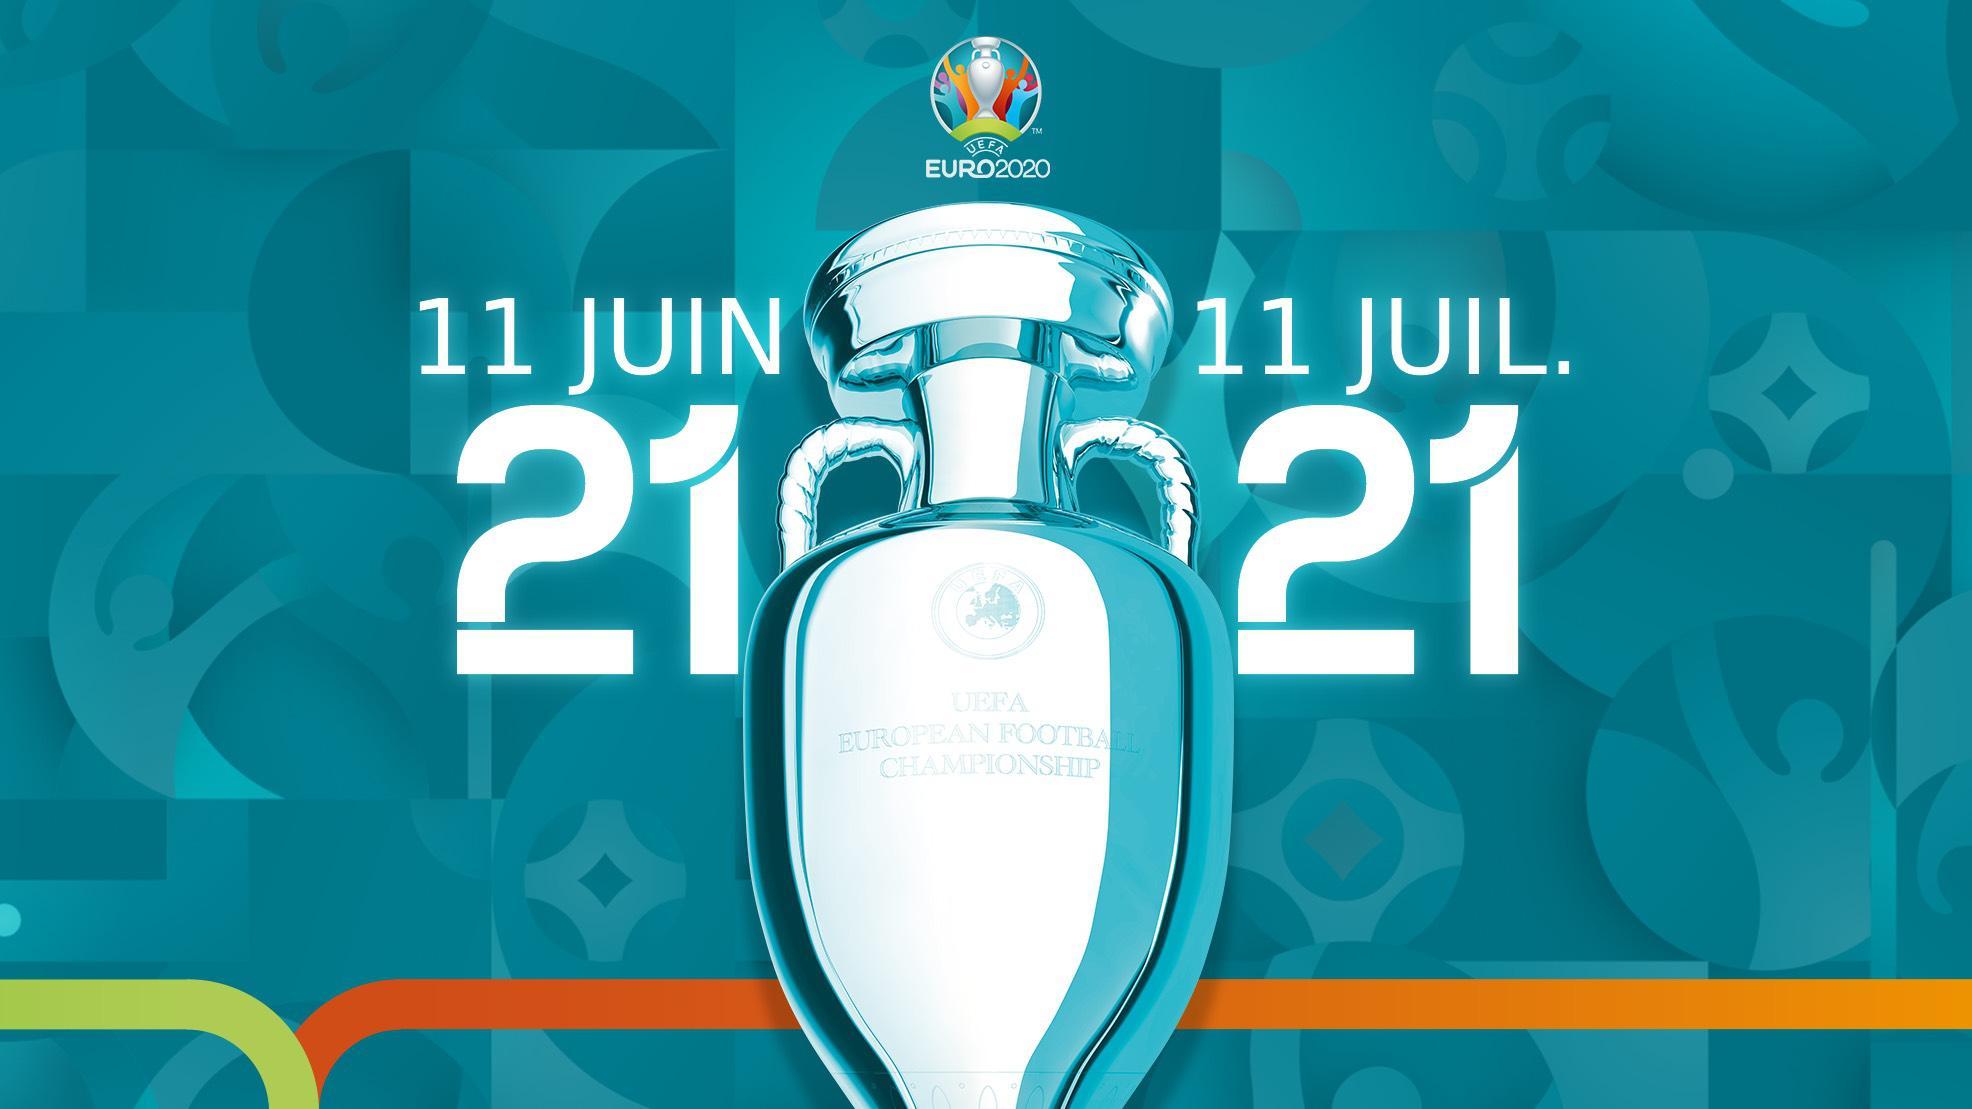 Le calendrier des matches de l'UEFA EURO 2020   UEFA EURO 2020   UEFA.com